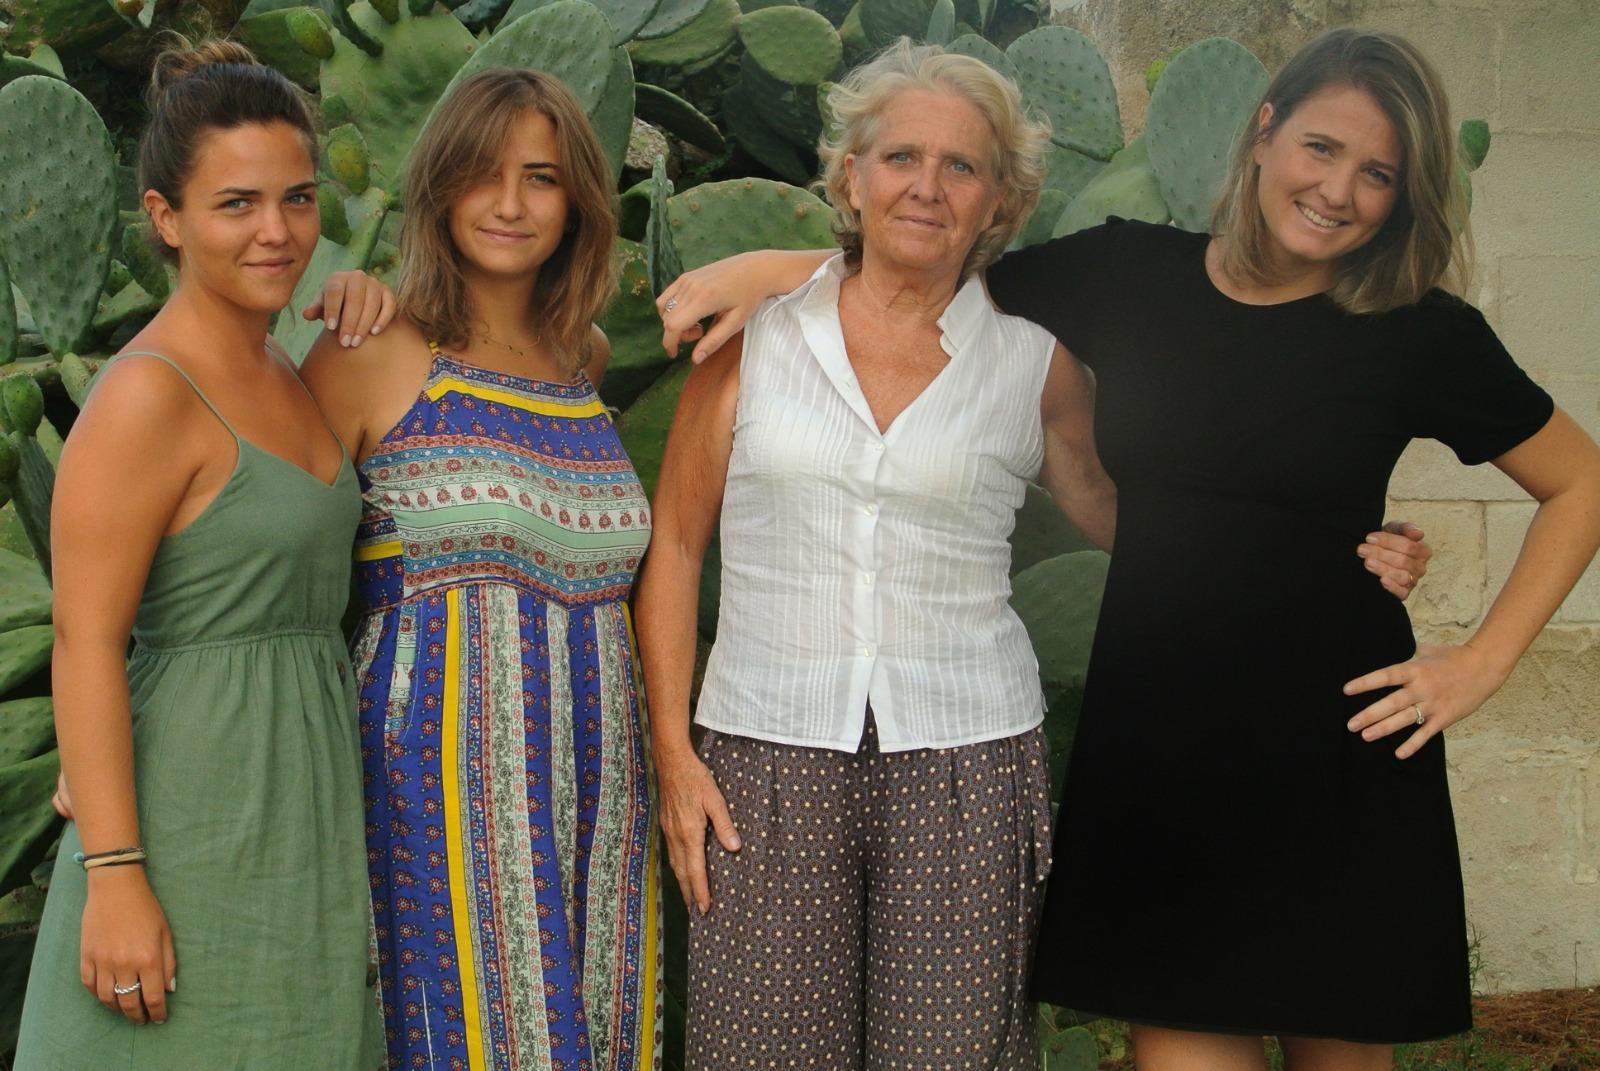 Fanny, Enrica, Annamaria e Francesca, l'anima di Vetrére